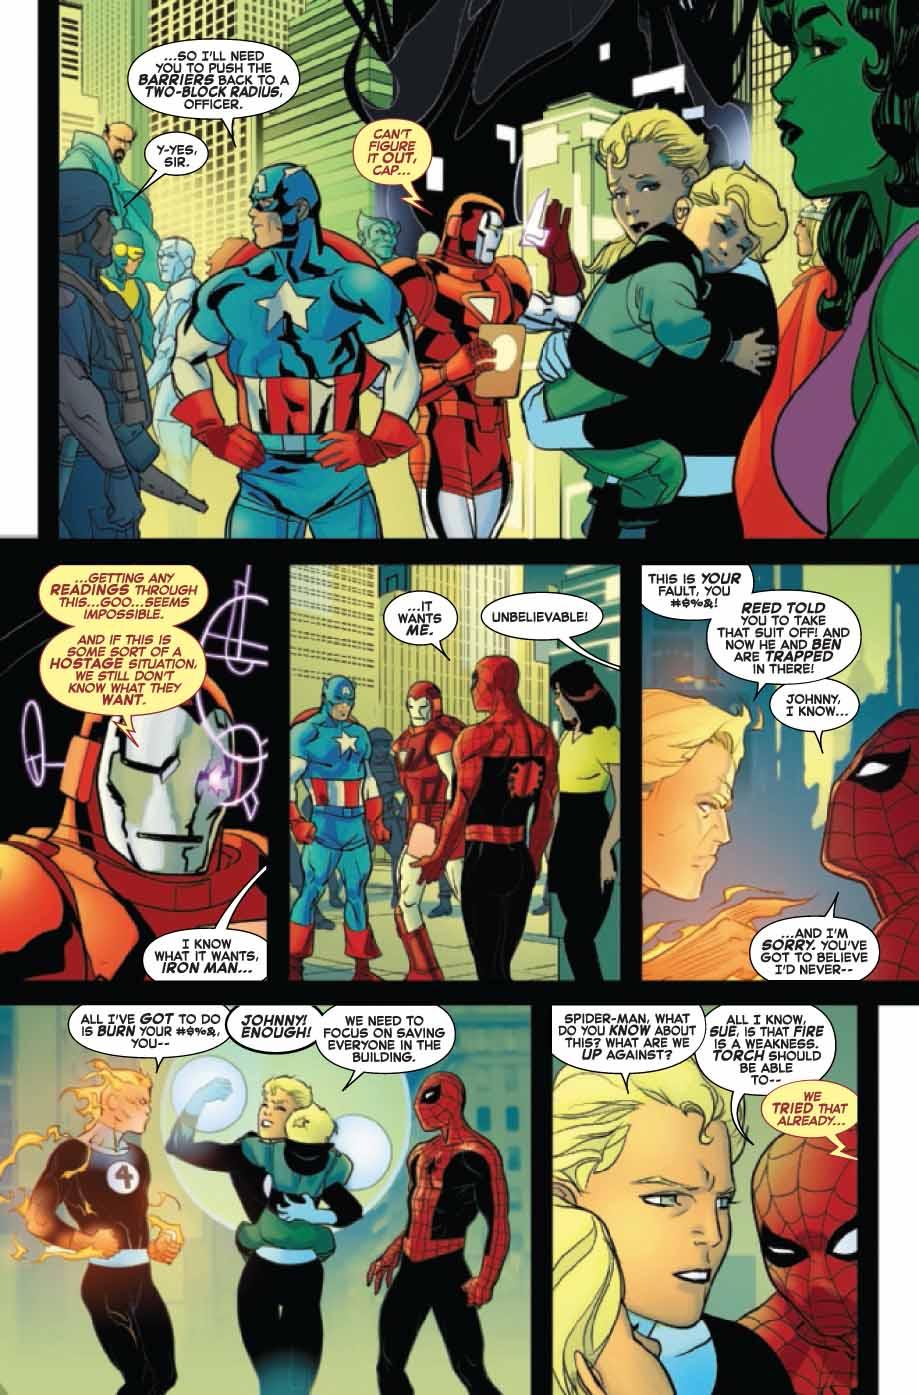 spiderman42